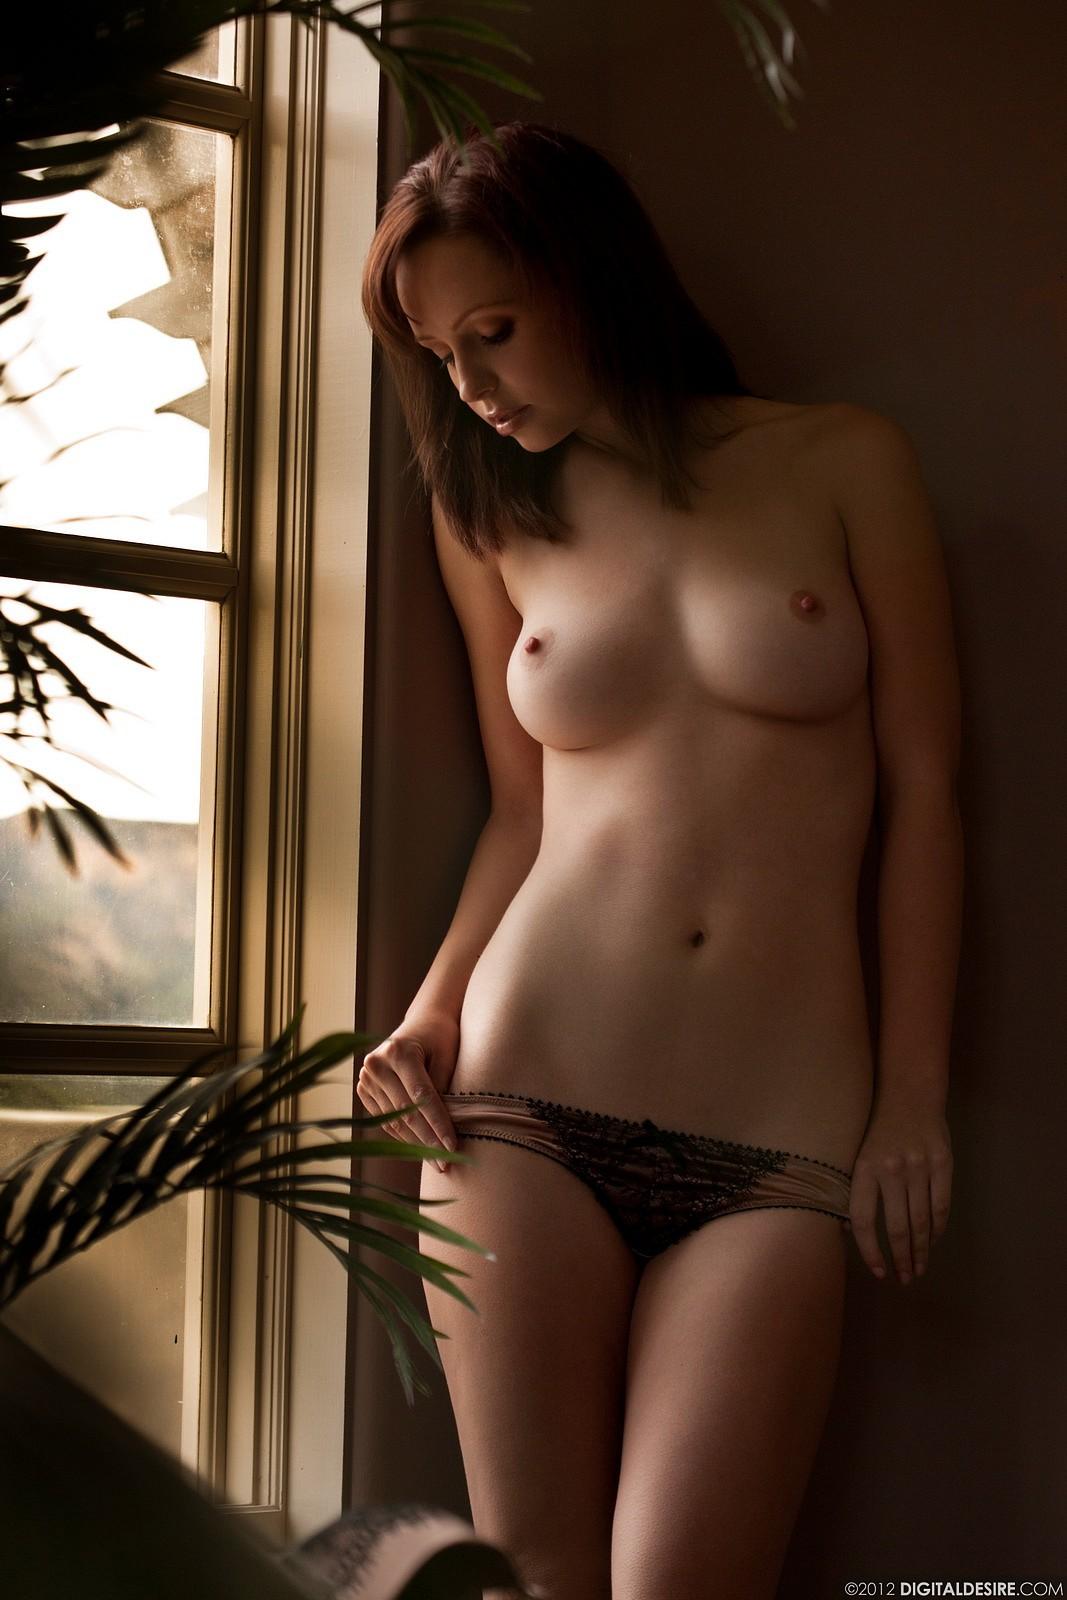 Attractive Sunlight On Nude Gallery Scenes